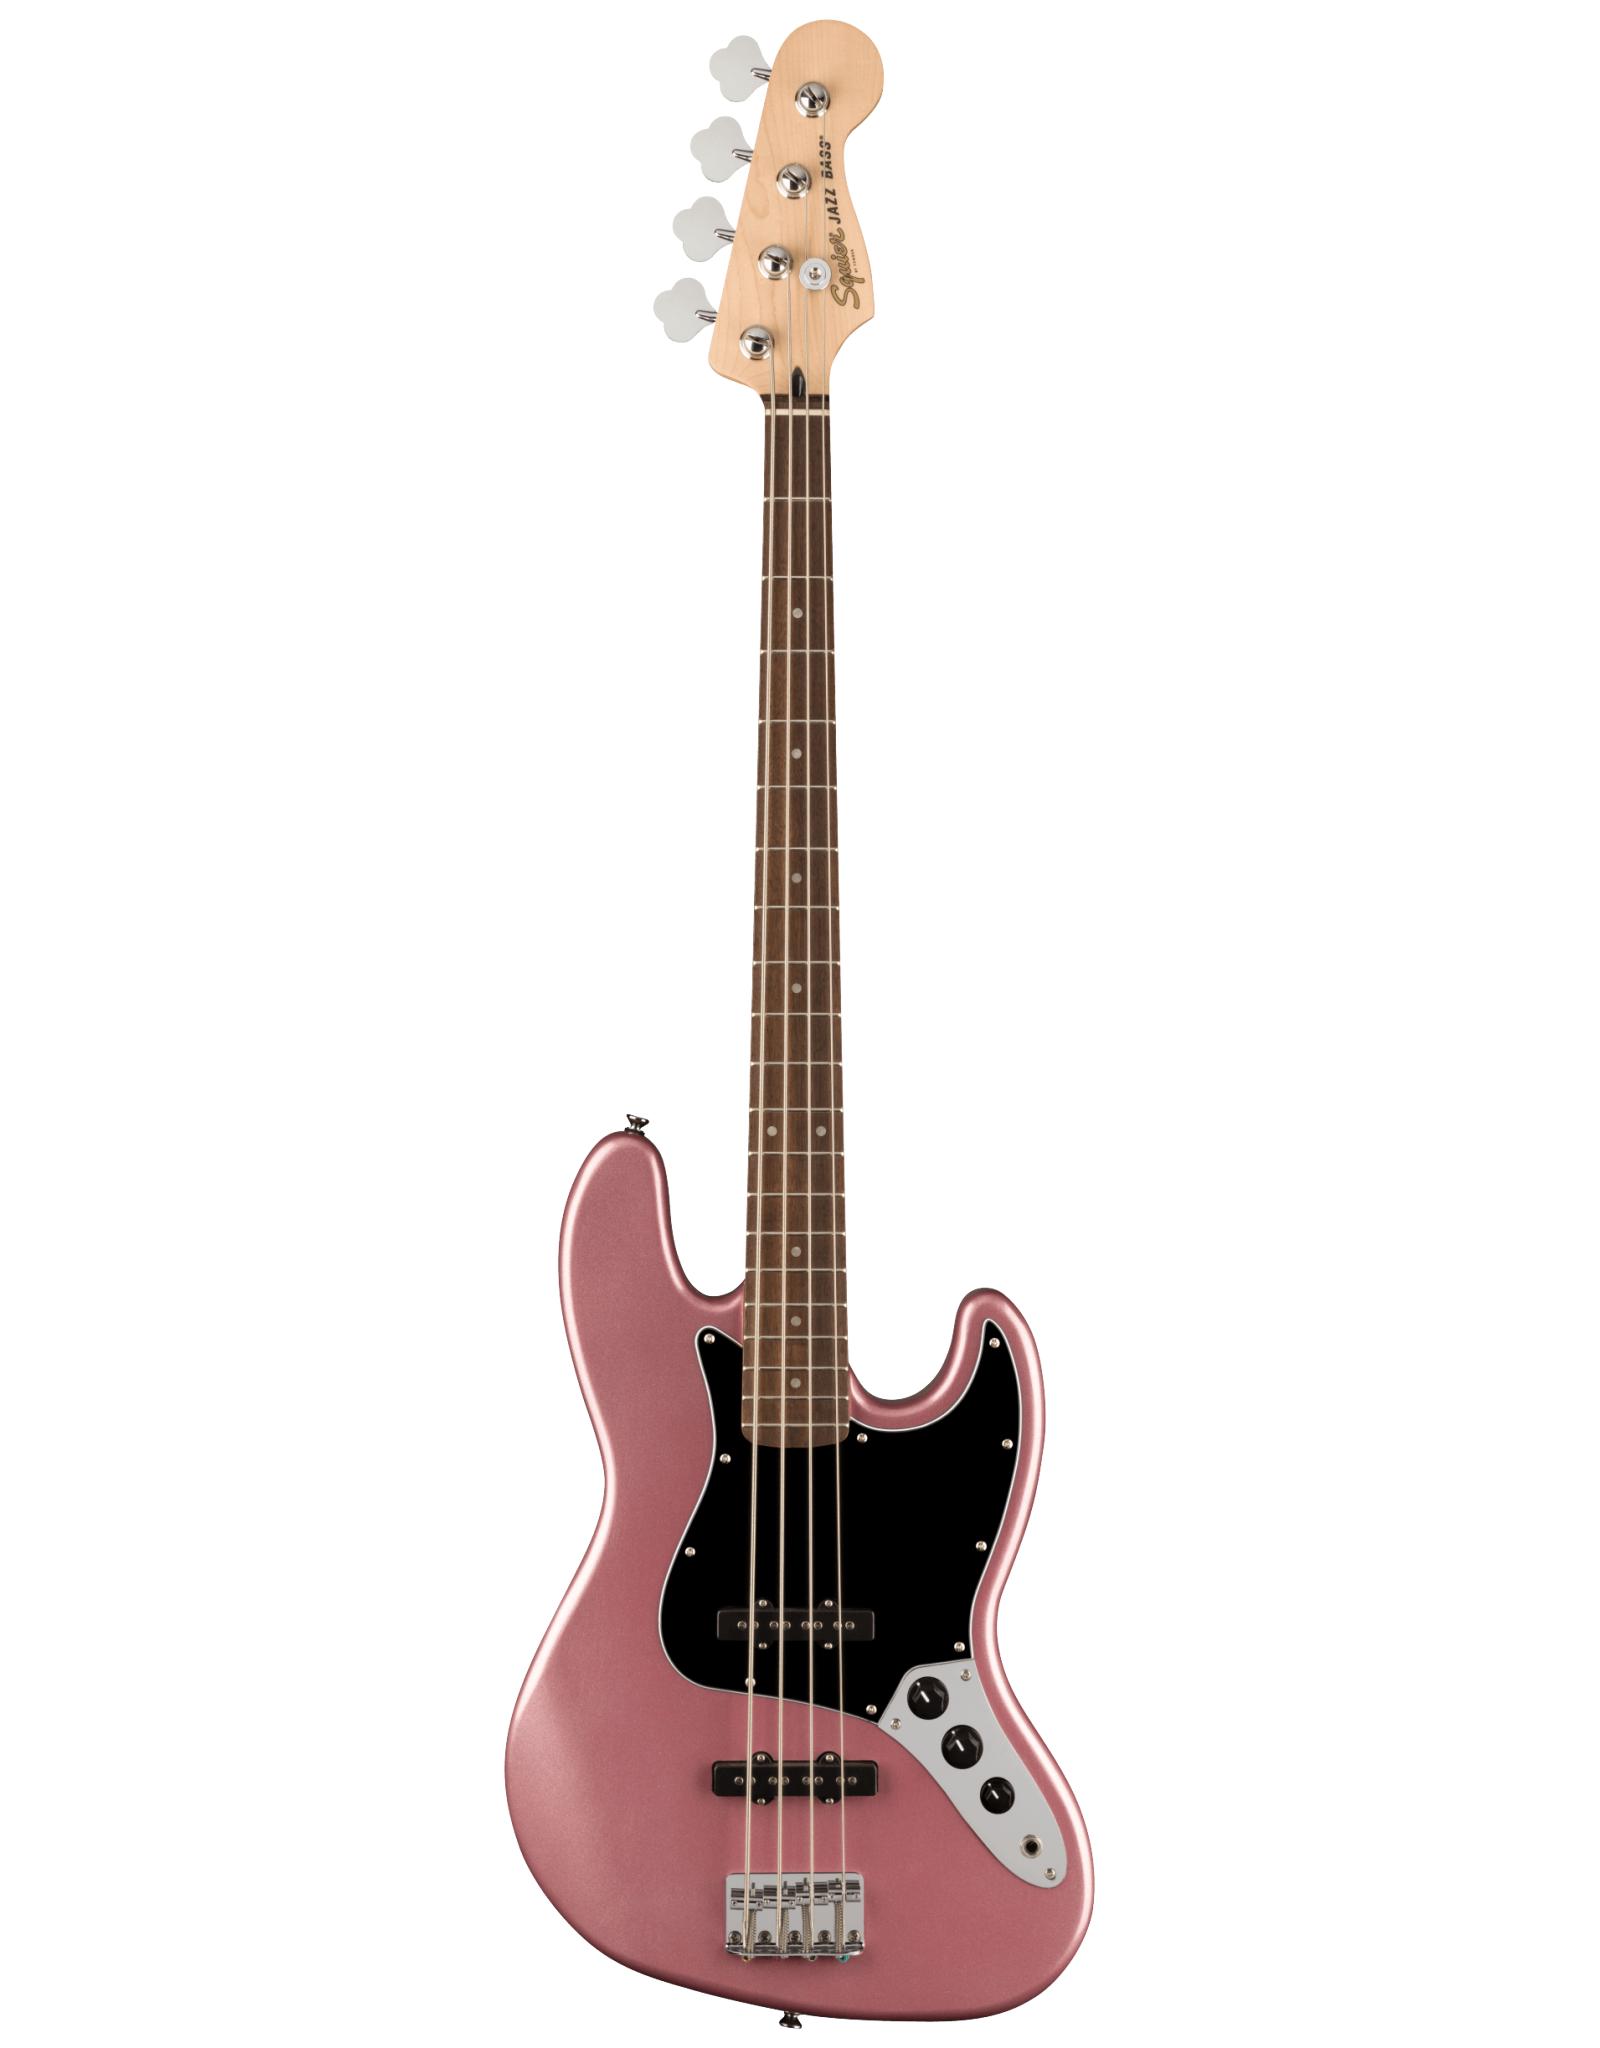 Squier Squier Affinity Series Jazz Bass, Laurel Fingerboard, Black Pickguard, Burgundy Mist